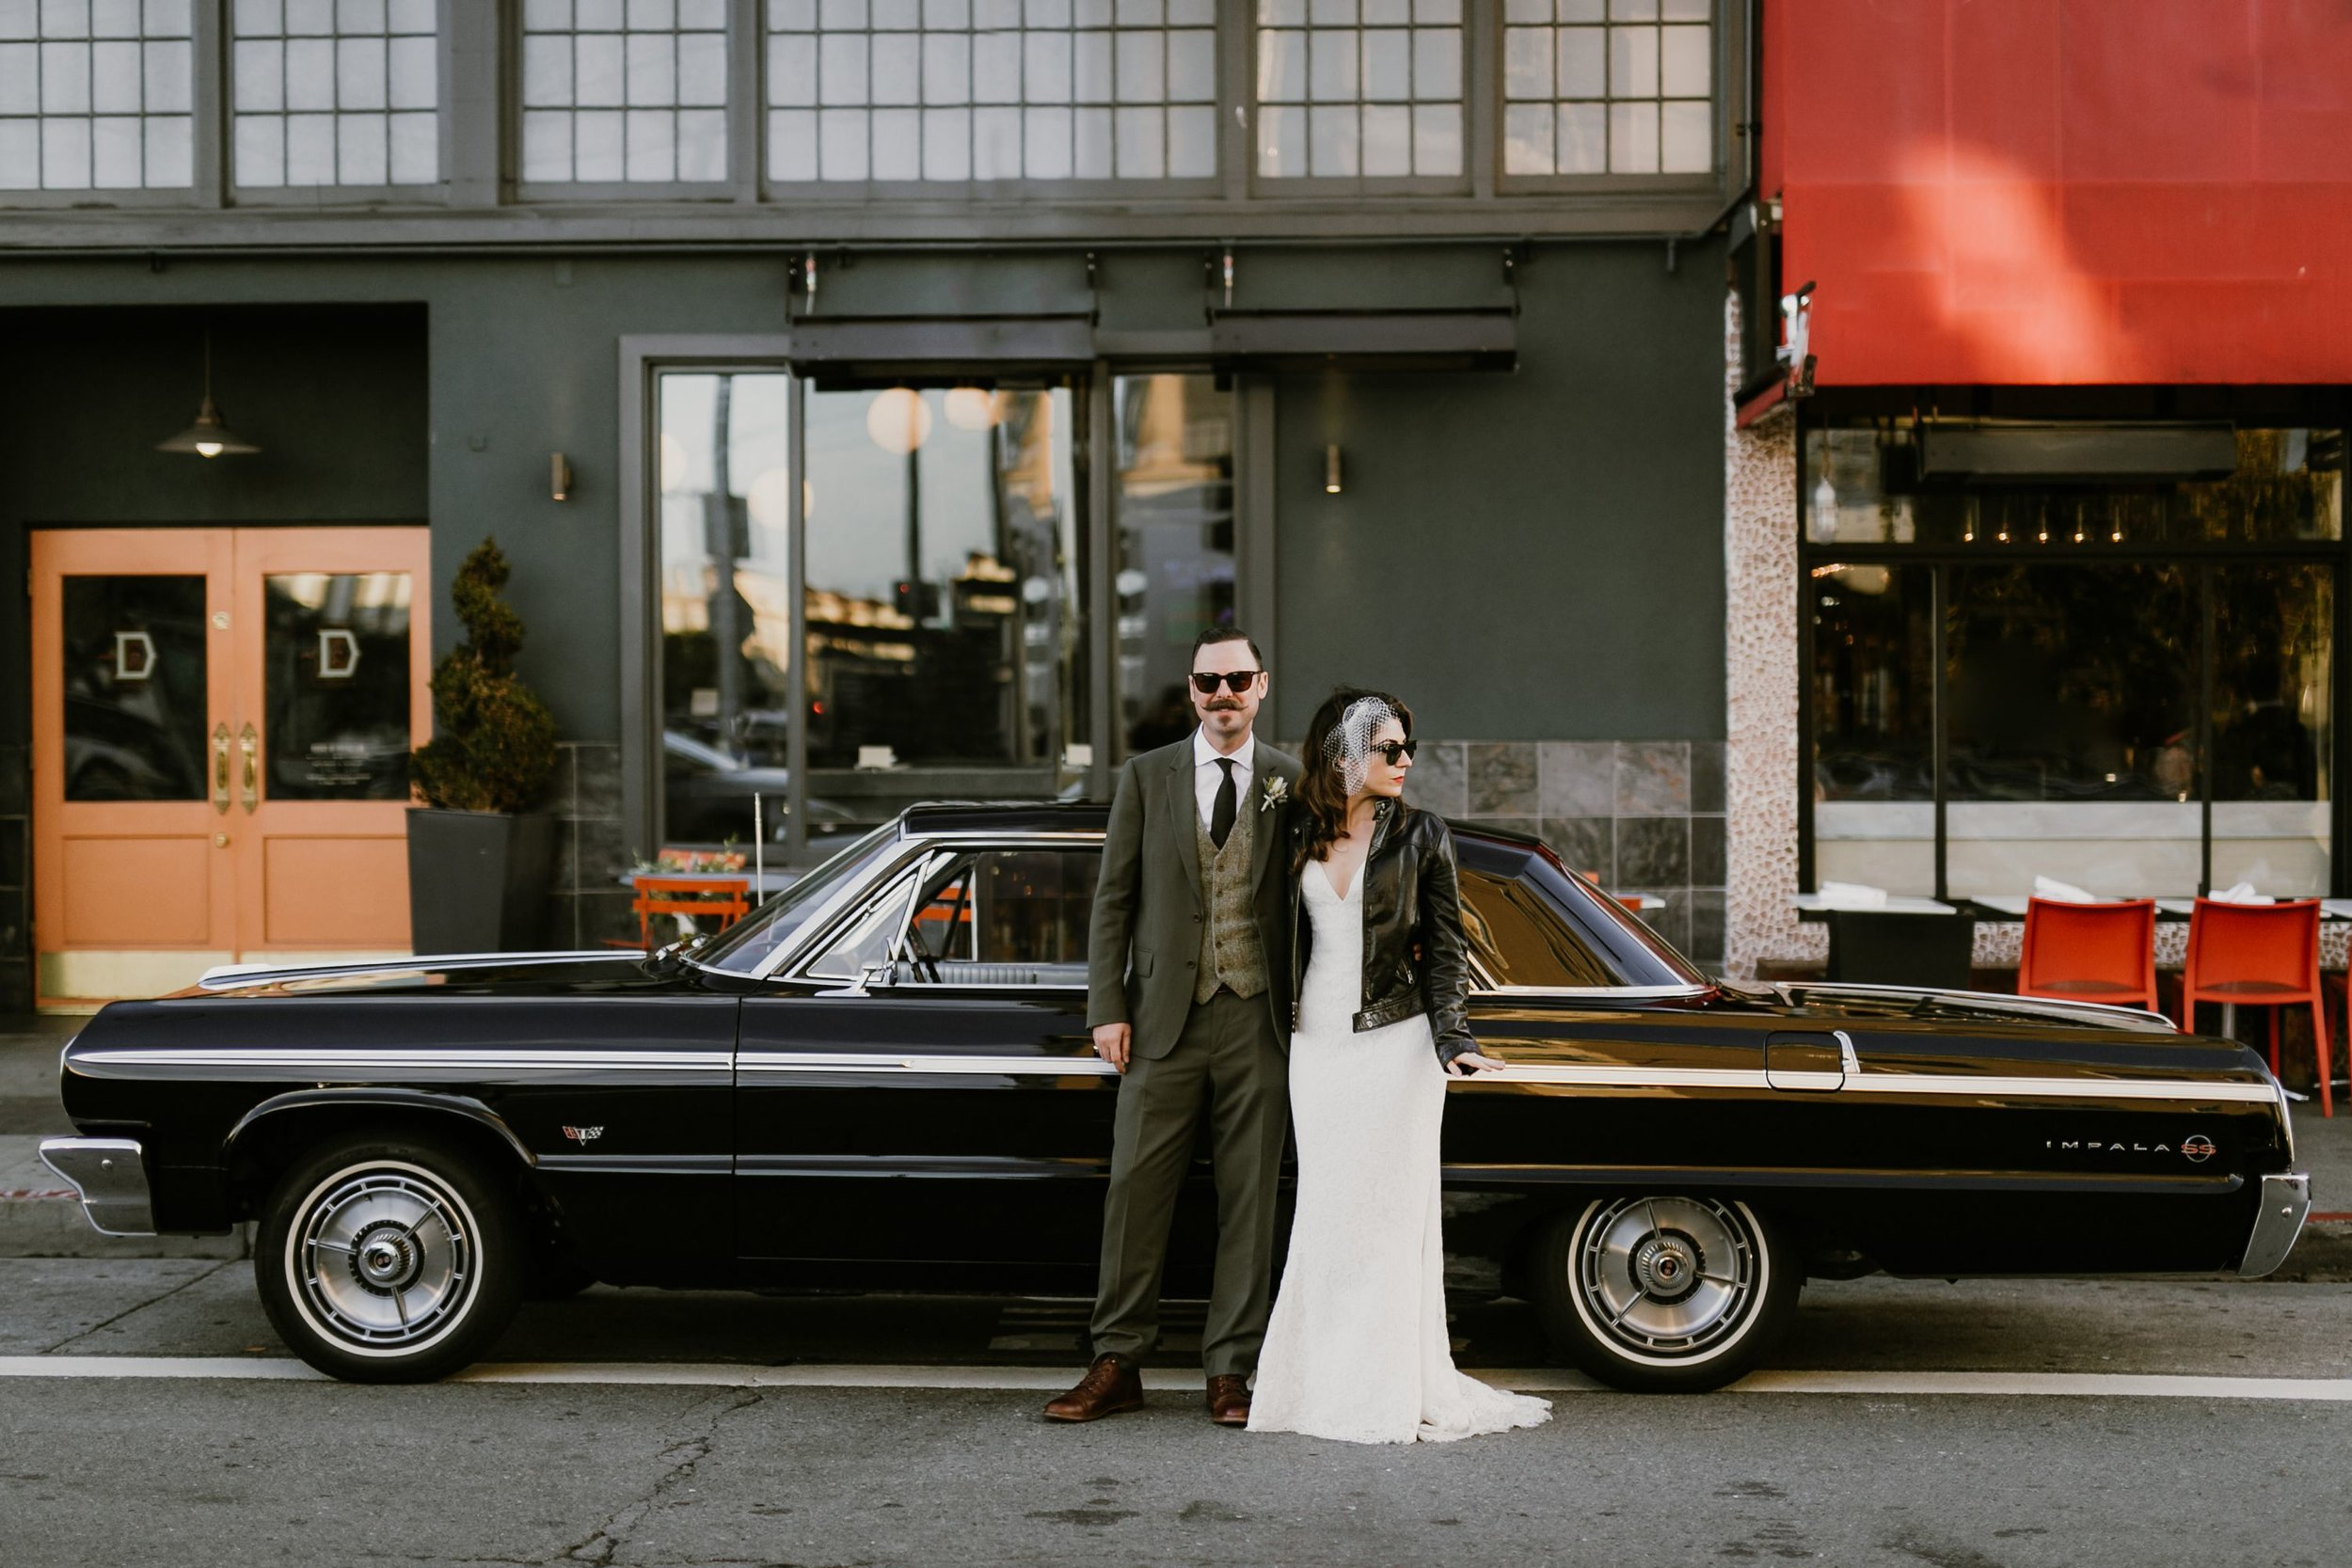 oregon-wedding-photo_0005.jpg